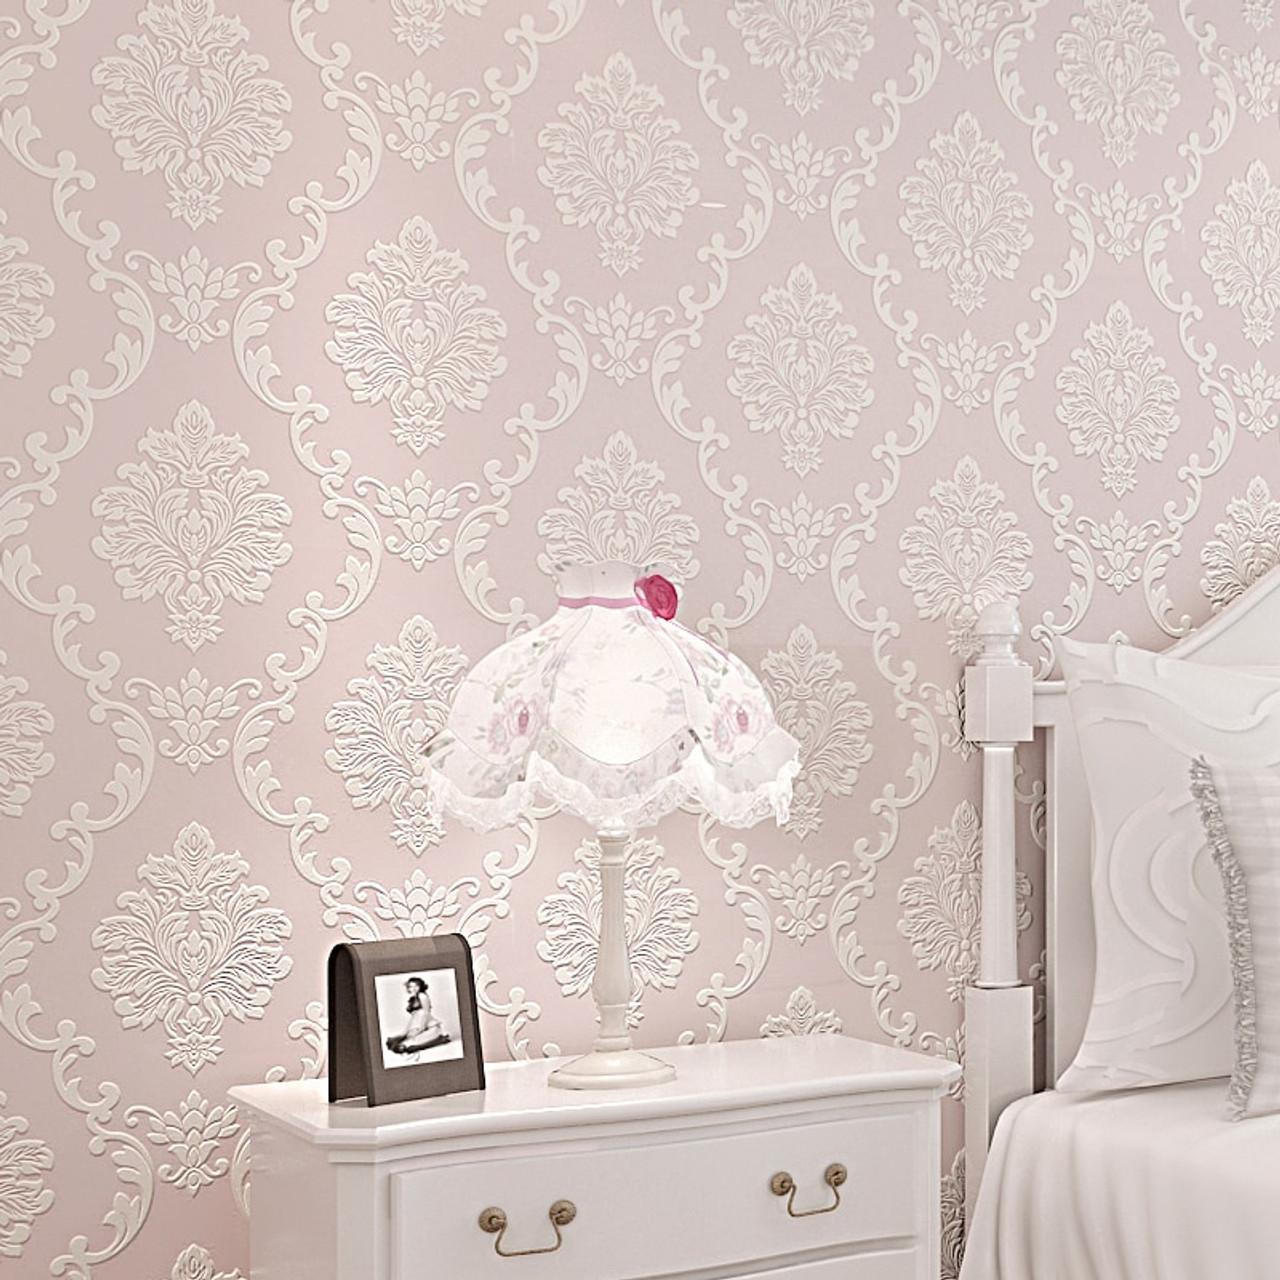 European Style 3d Embossed Floral Luxury Damask Wallpaper For Living Room Bedroom Tv Background Desktop Wallpaper Roll For Walls